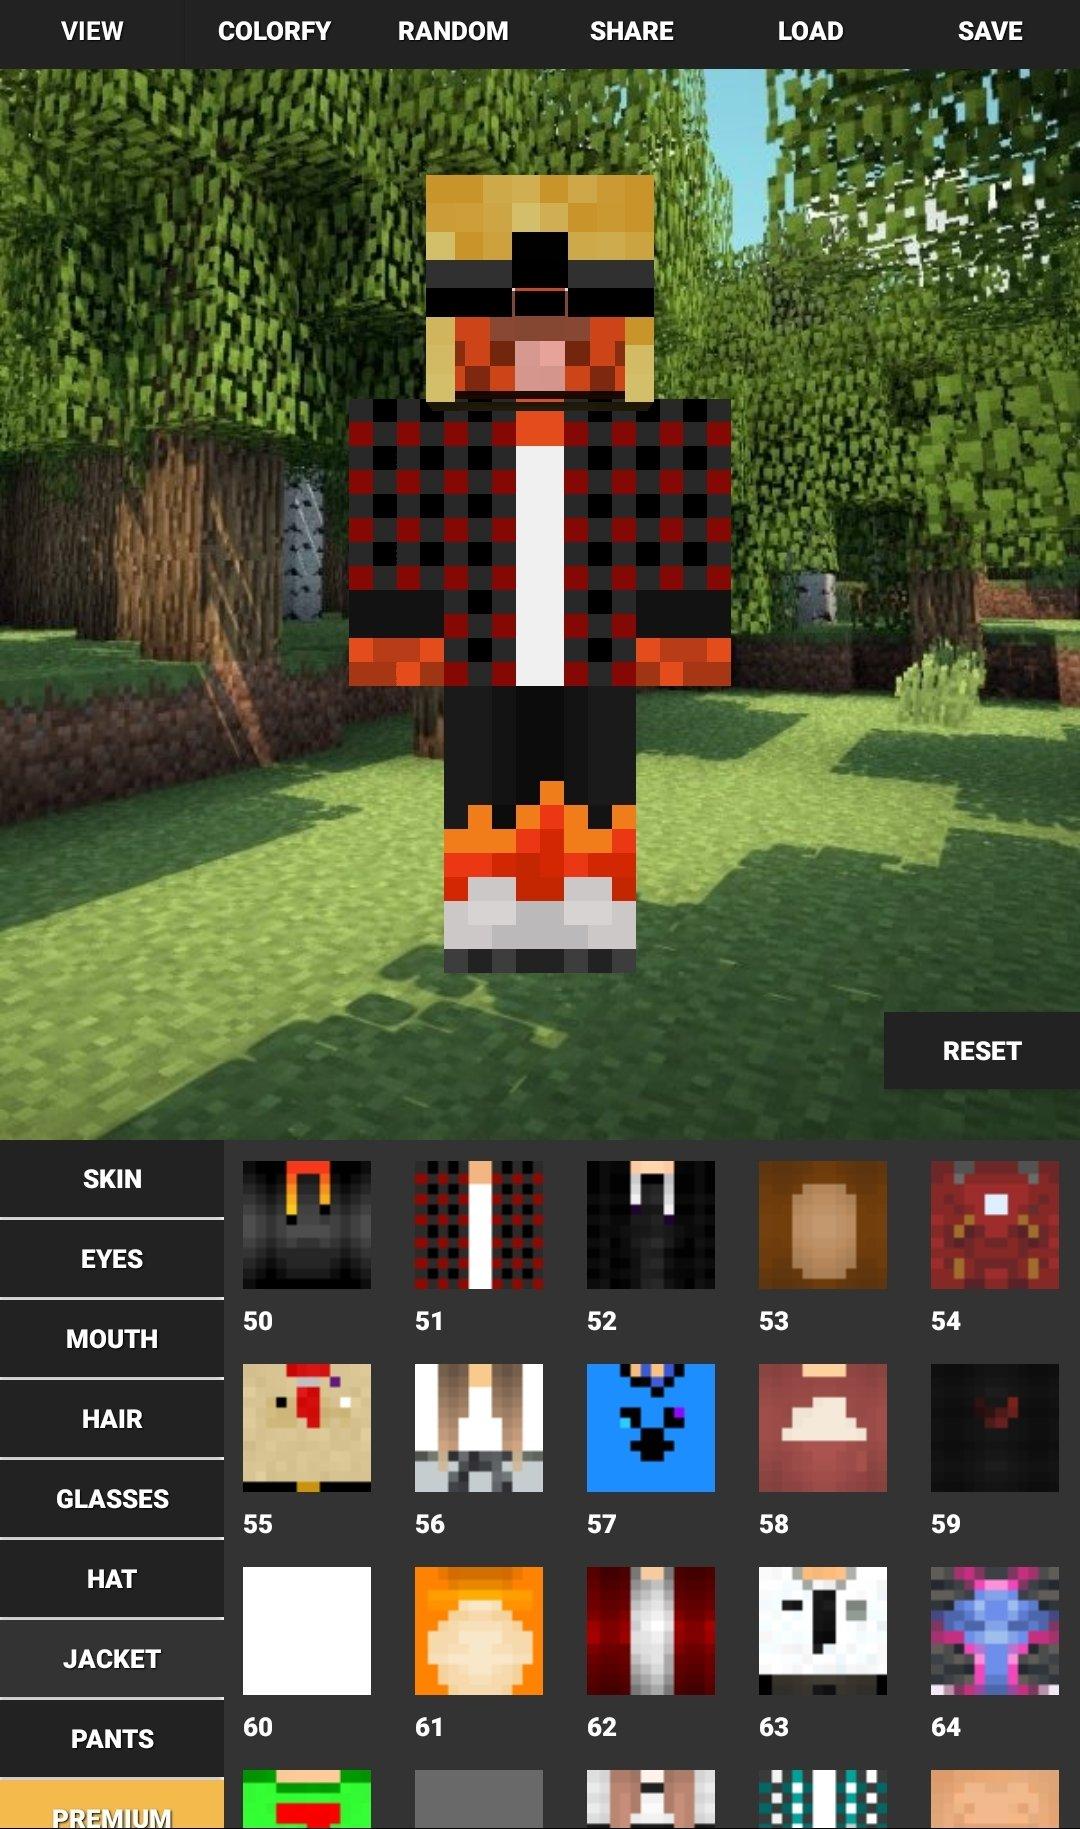 Custom Skin Creator For Minecraft 11.11 - Baixar para Android APK